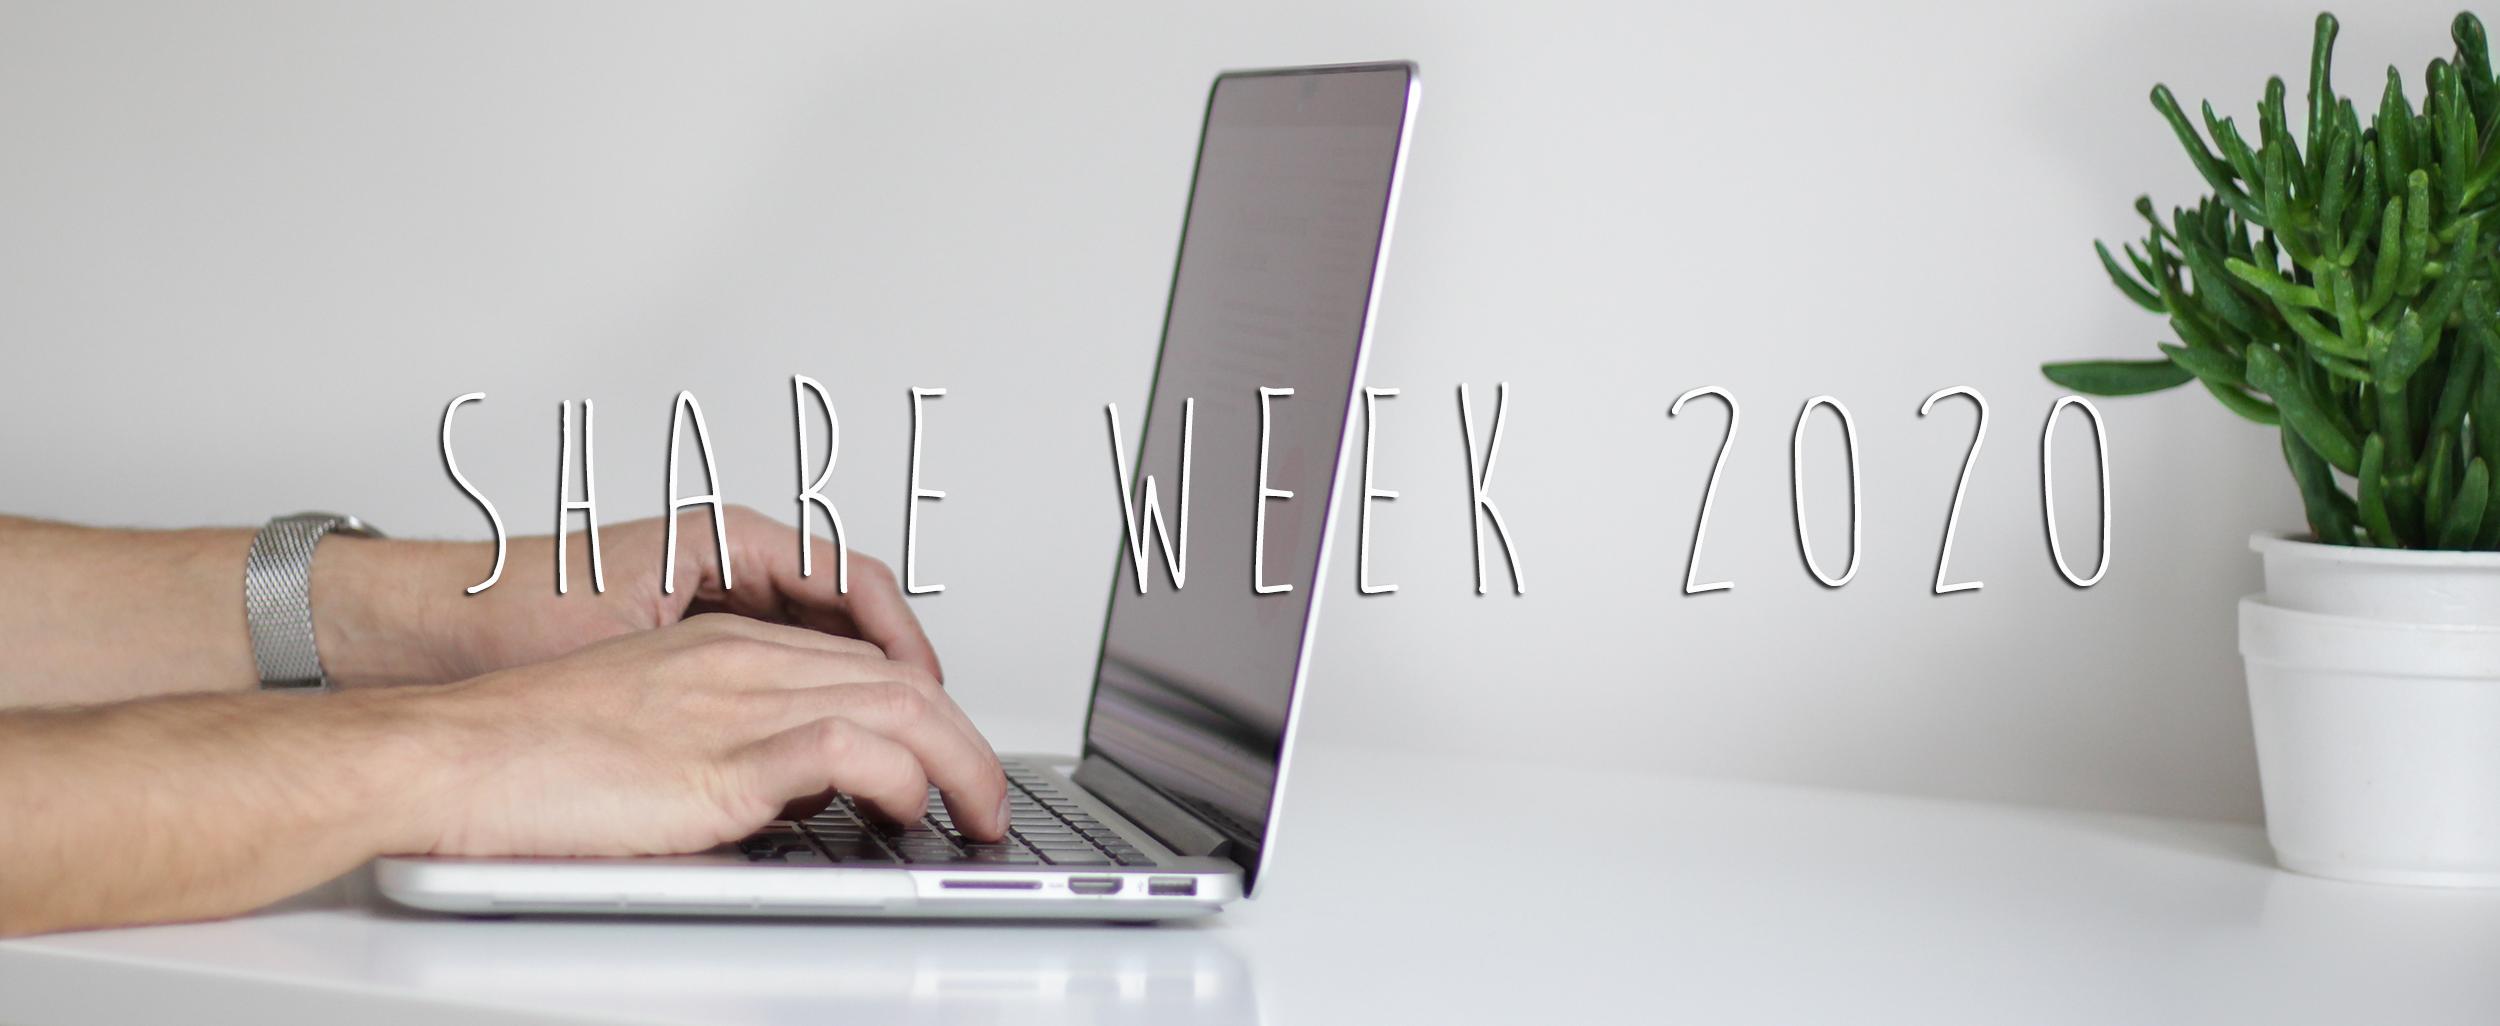 share-week-2020